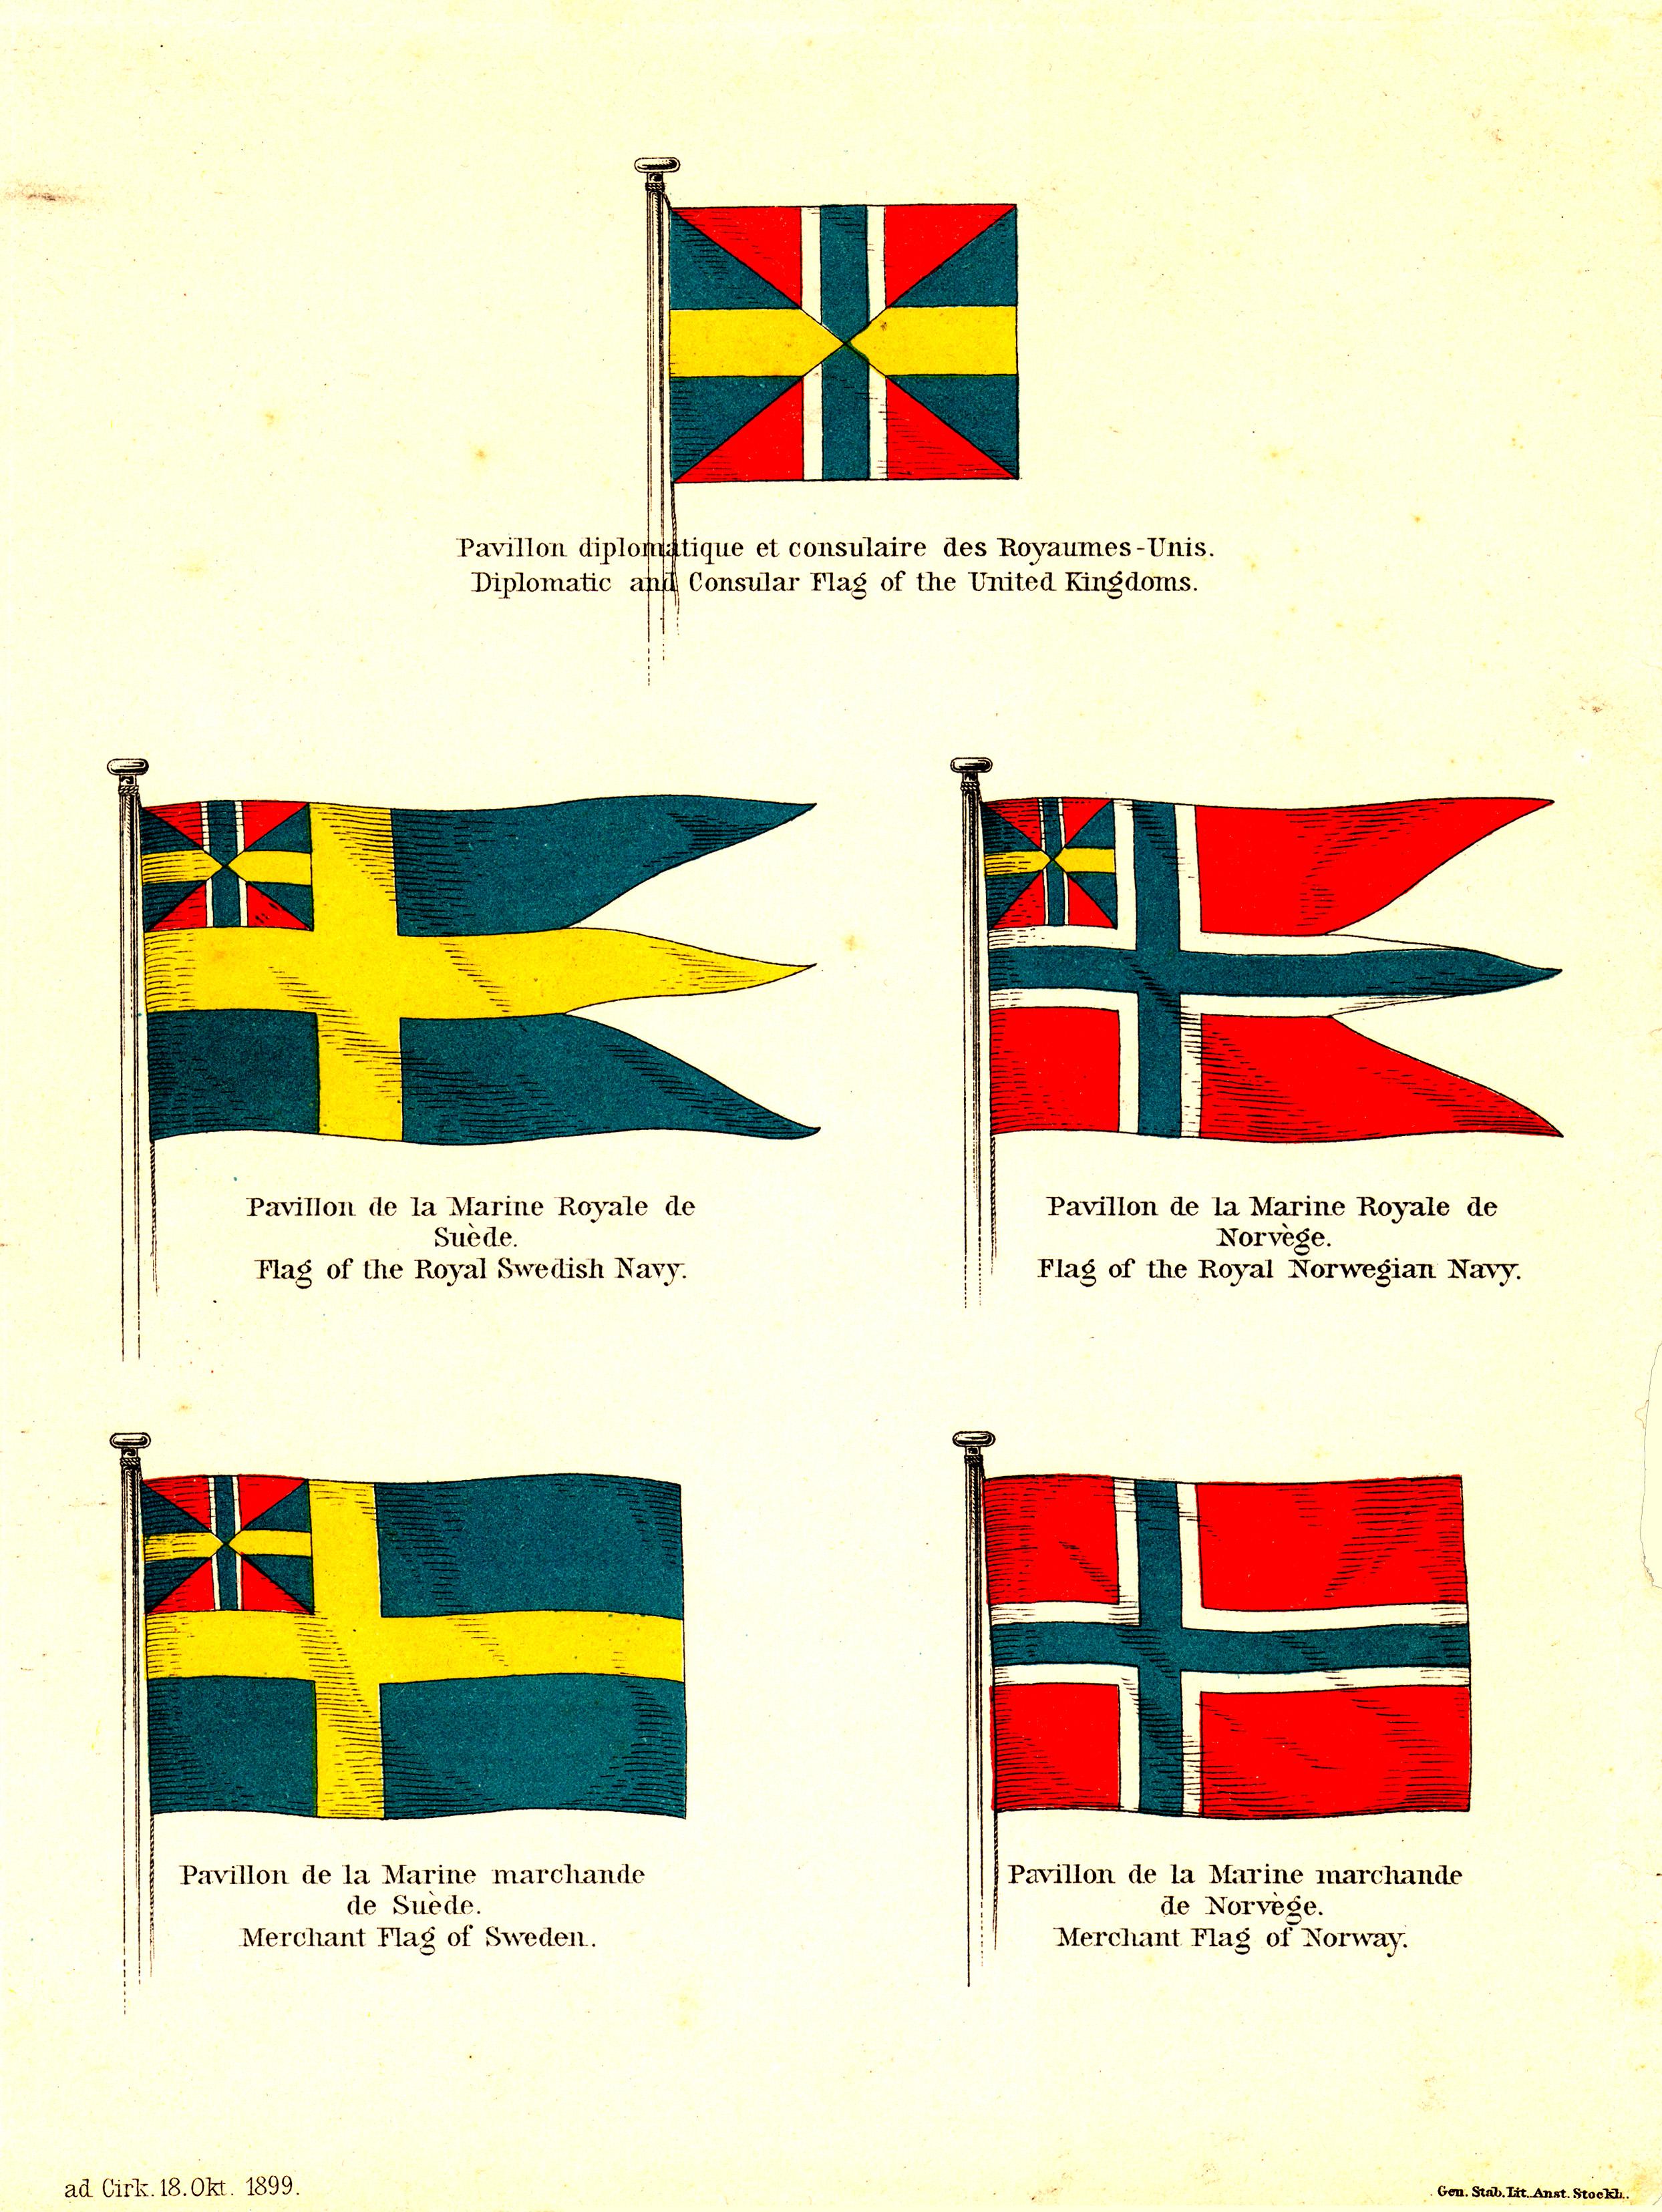 svensk historie